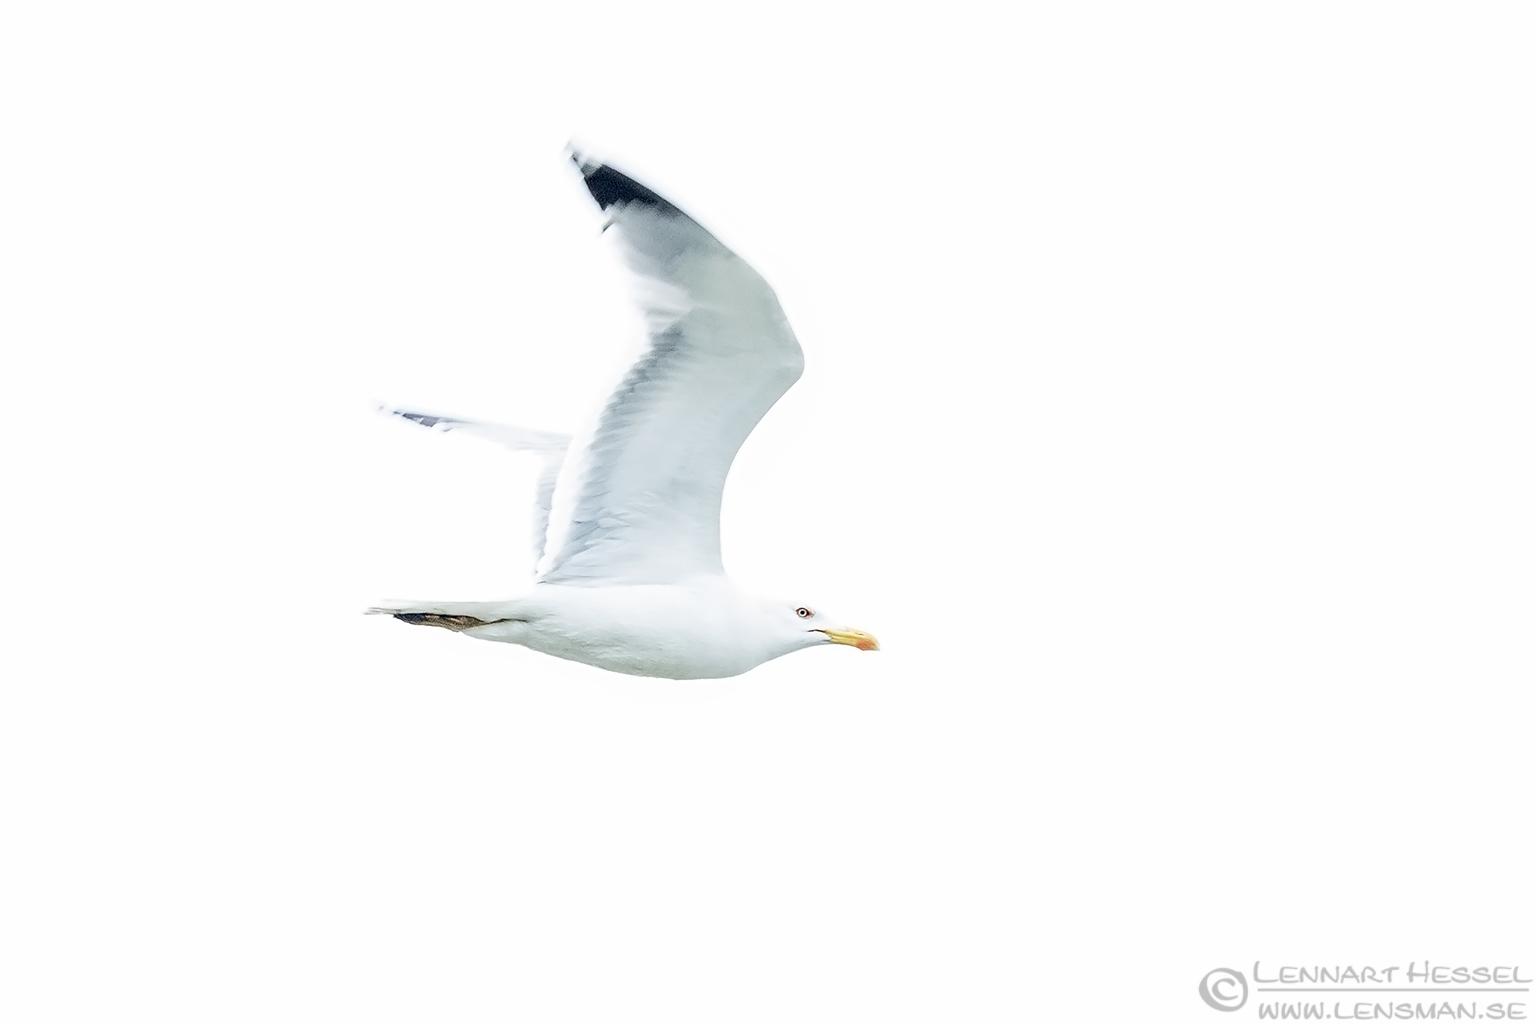 Yellow-legged Gull high key Bulgaria 2016